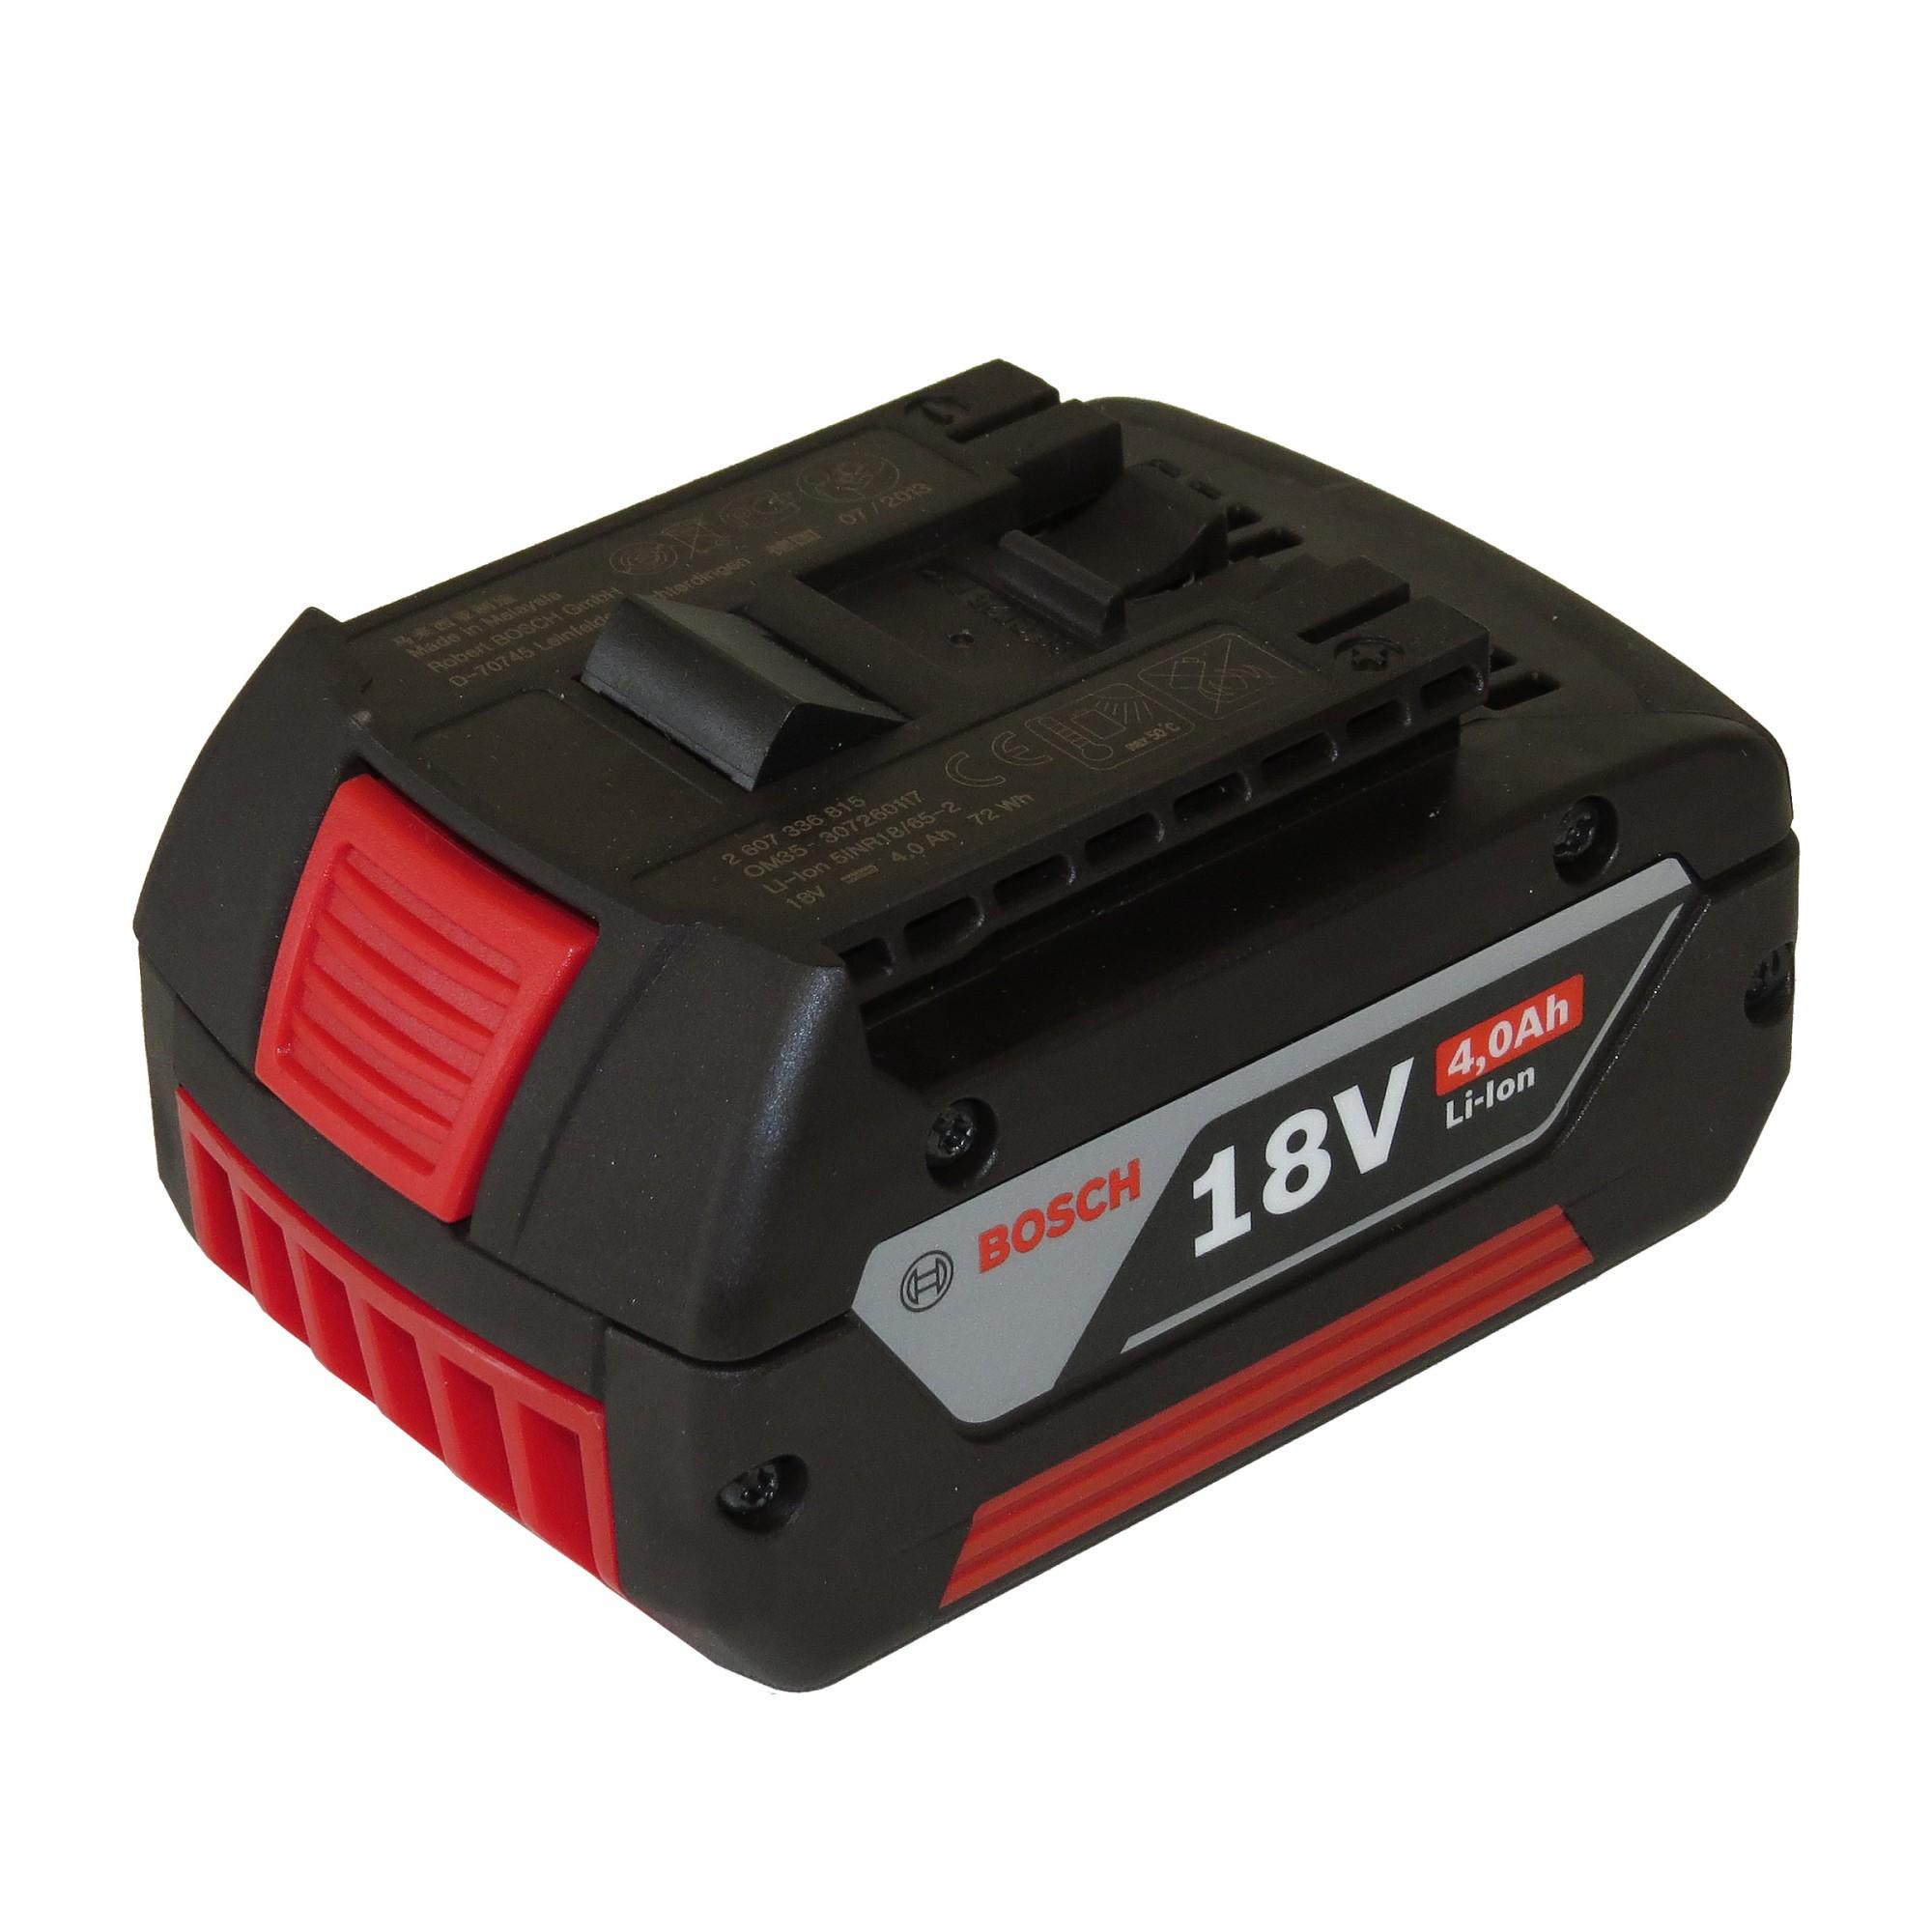 Bosch Akku GBA 18V Li (4,0 AH) Bestpreis durch Hornbach TPG